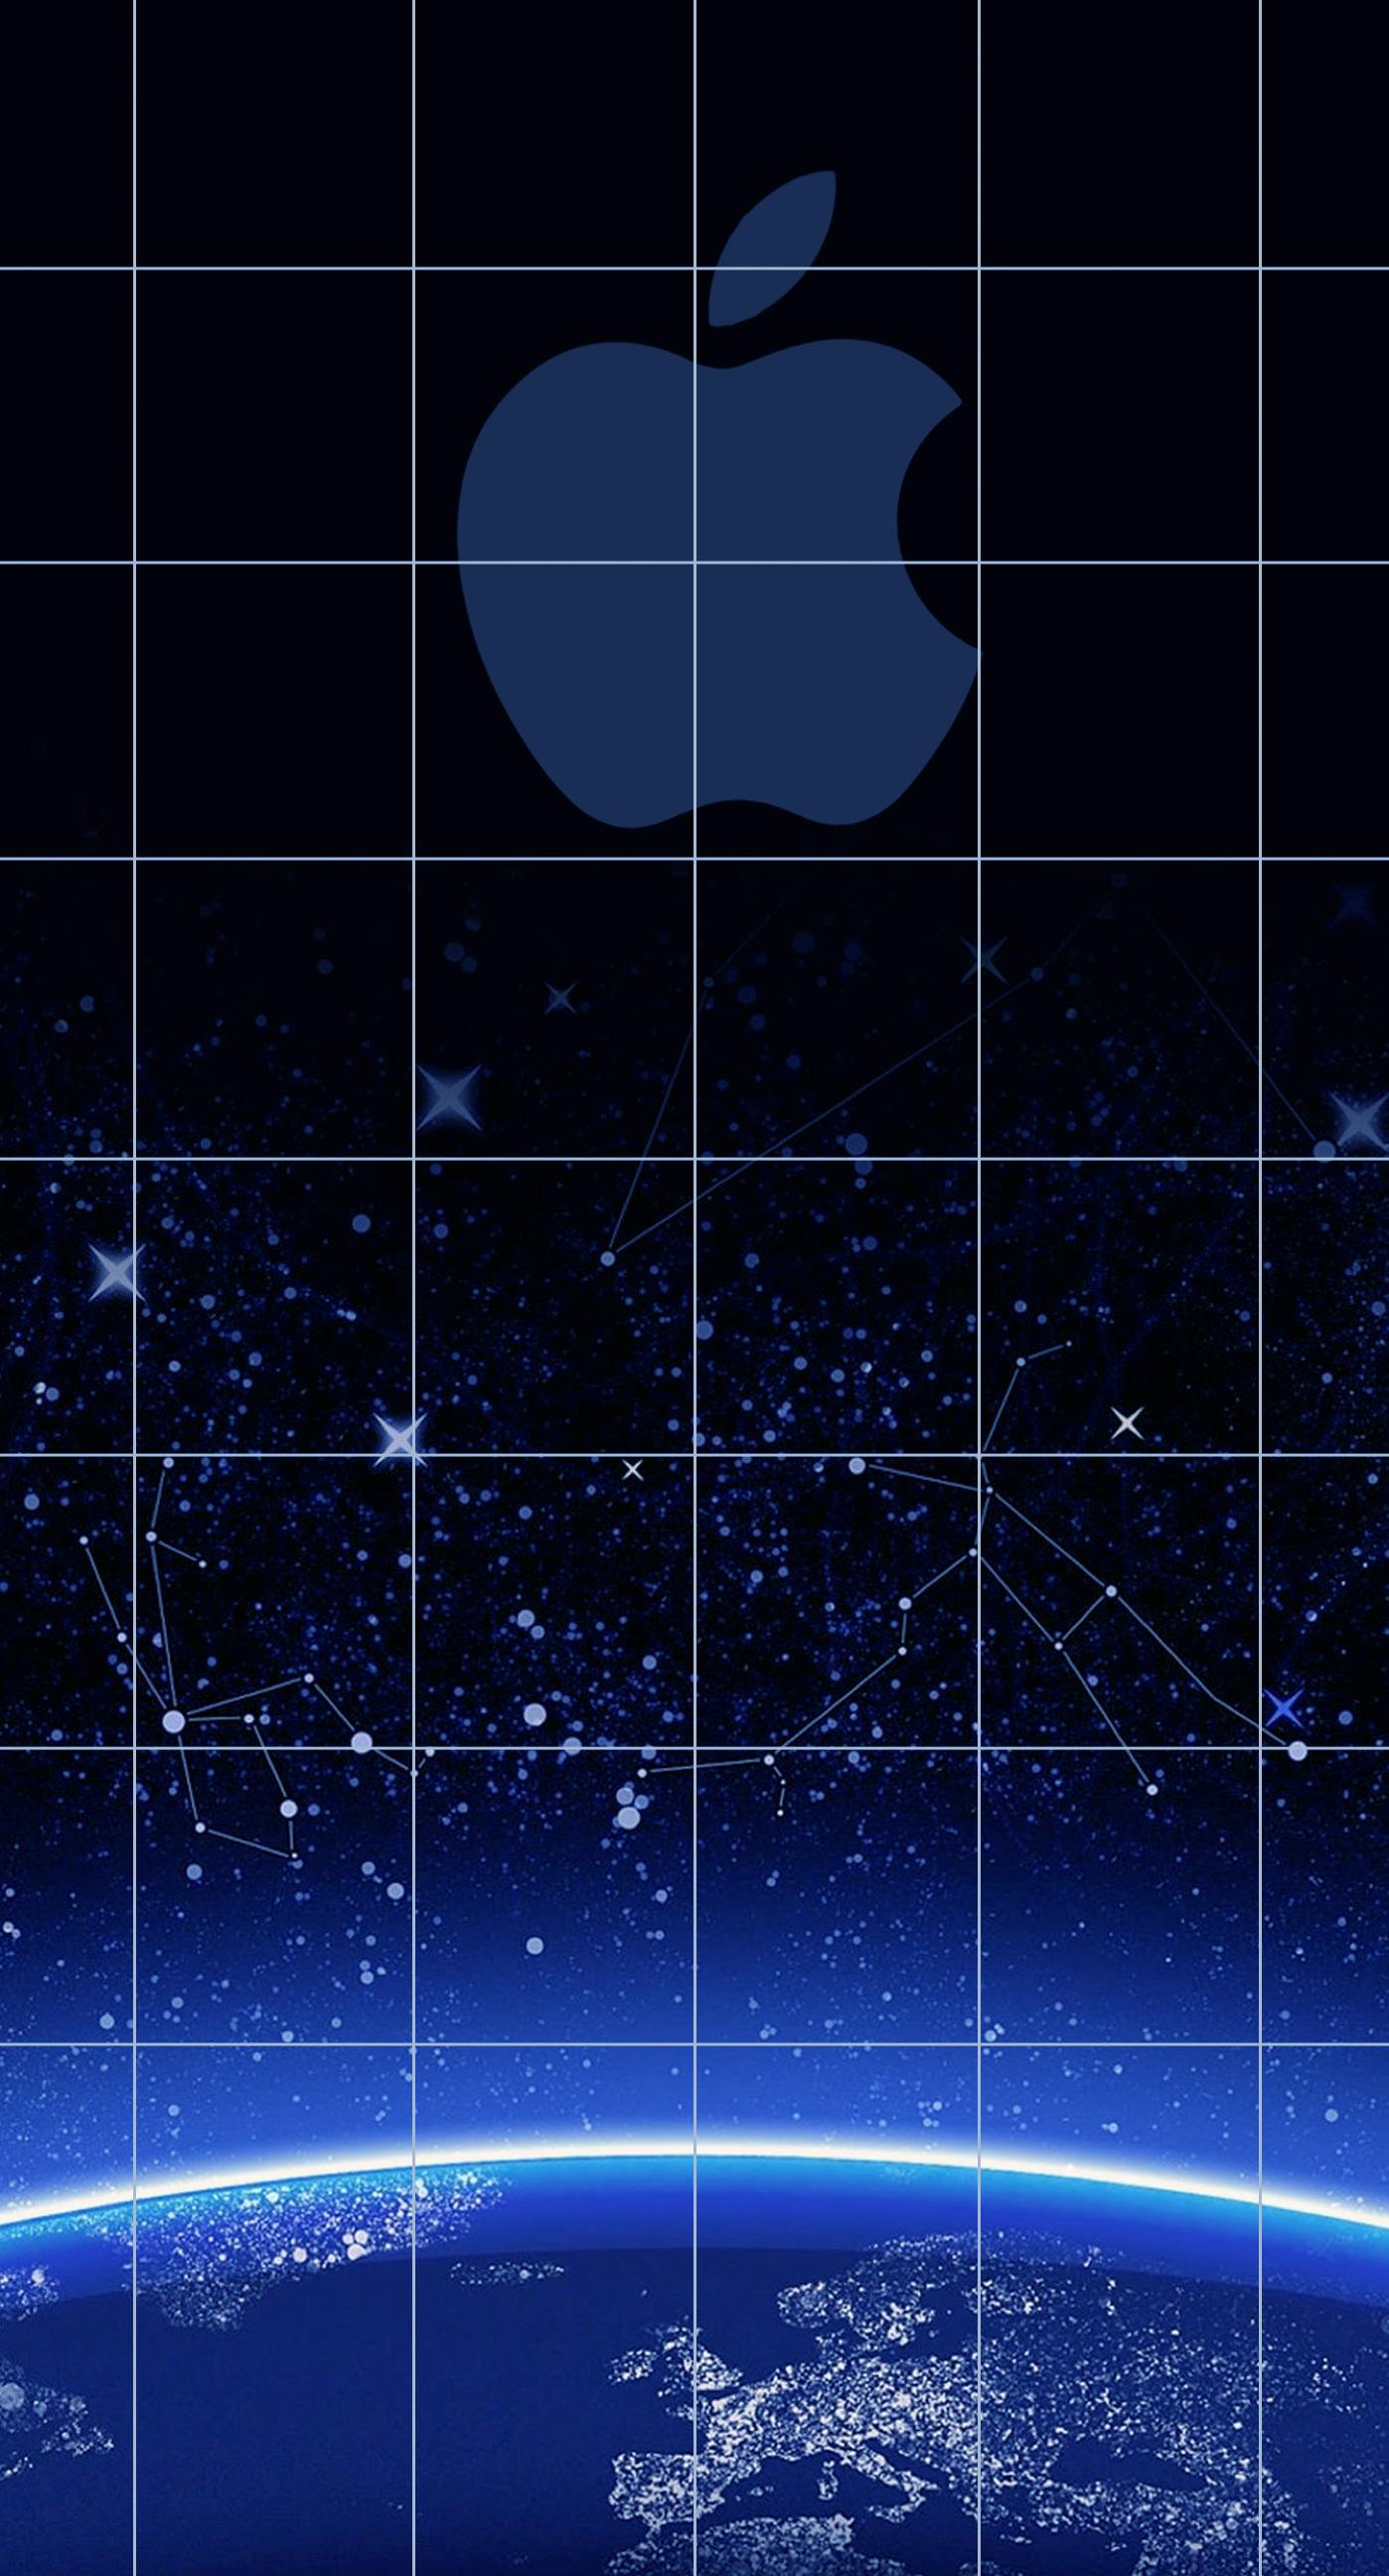 Apple logo shelf cool blue universe wallpapersc iPhone7Plus 1398x2592